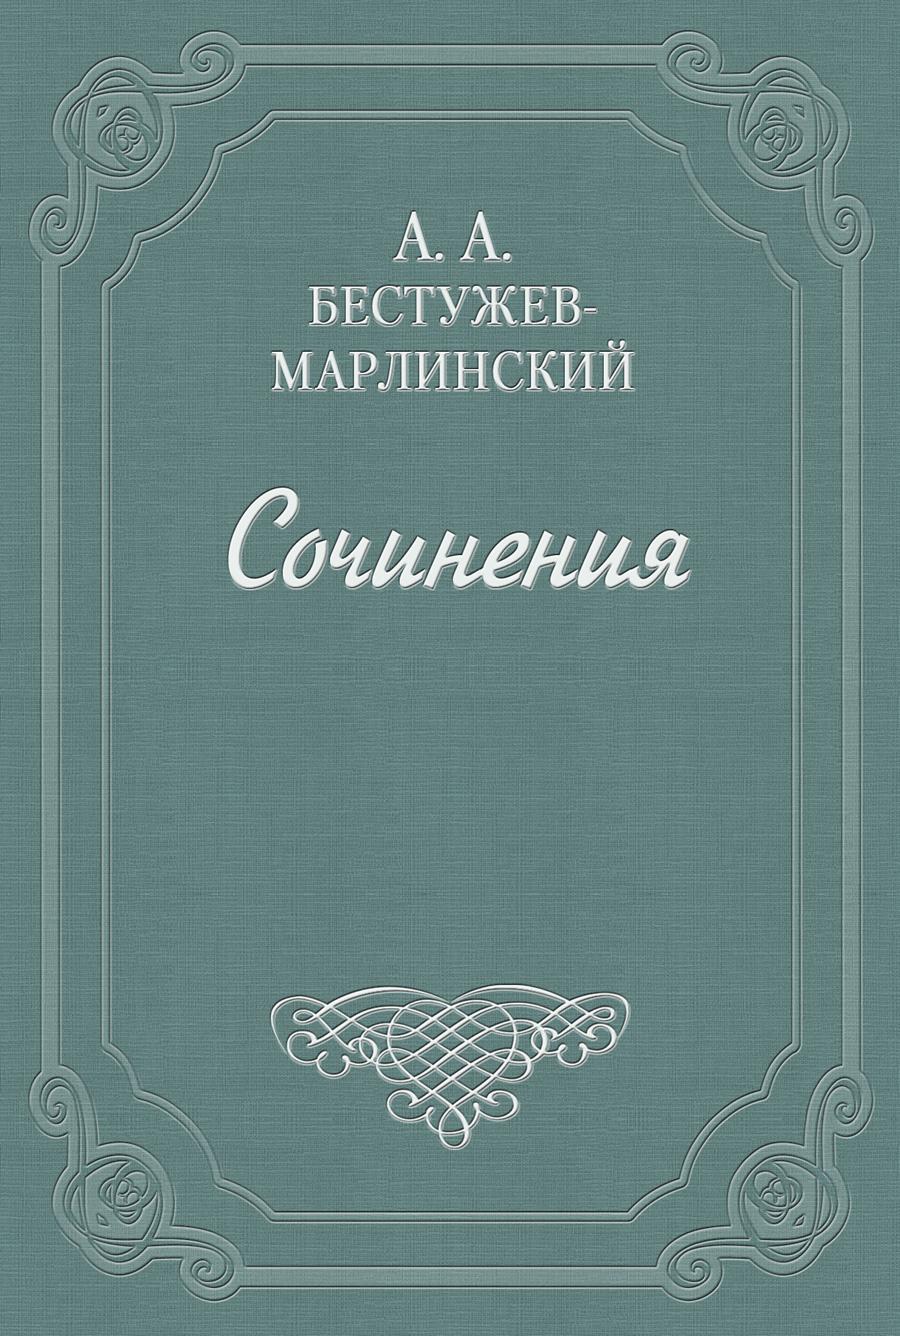 Александр Александрович Бестужев-Марлинский (О переводе)